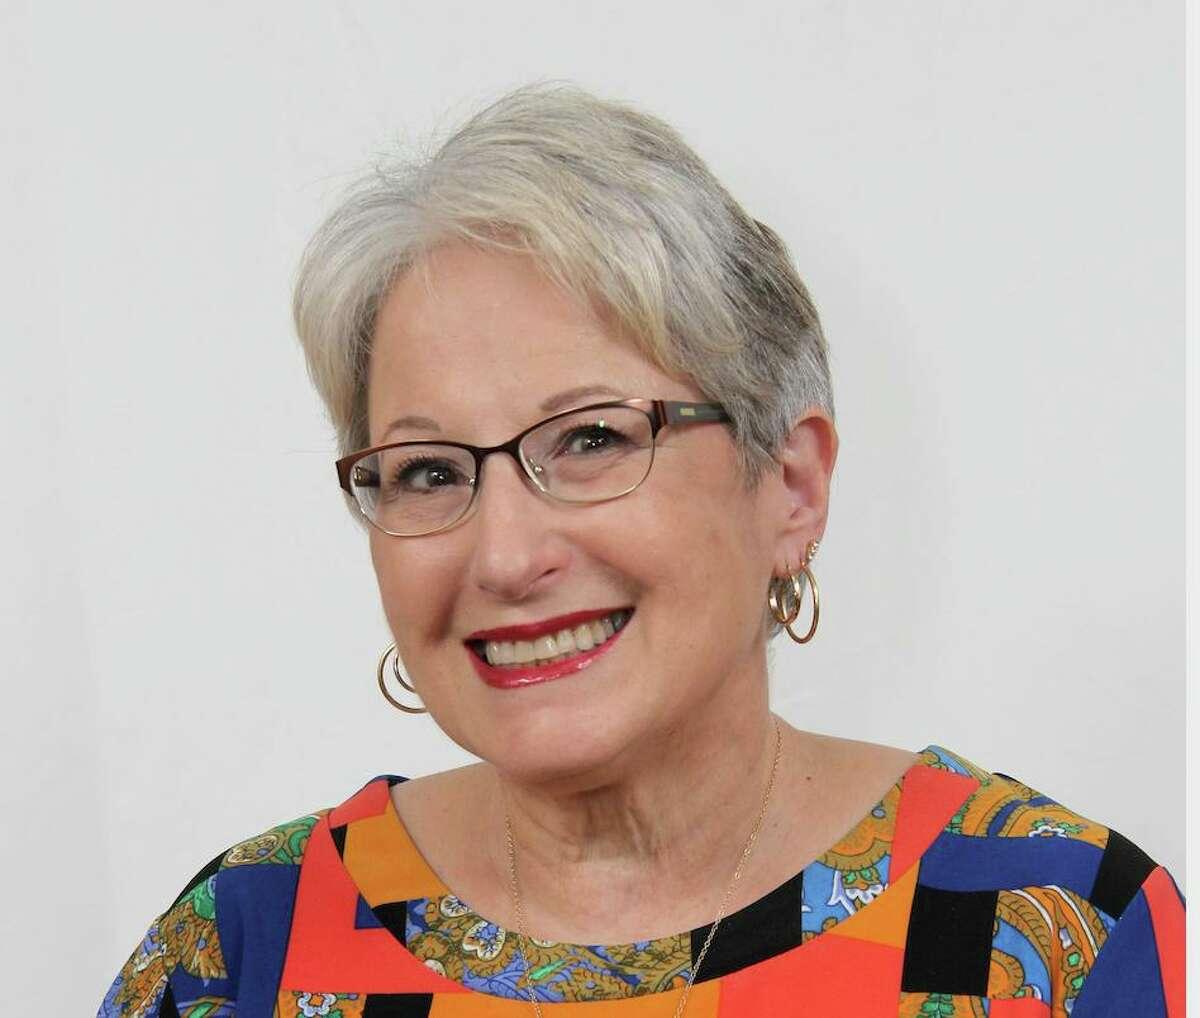 Bethel Planning & Zoning Commission candidate Penny Kessler